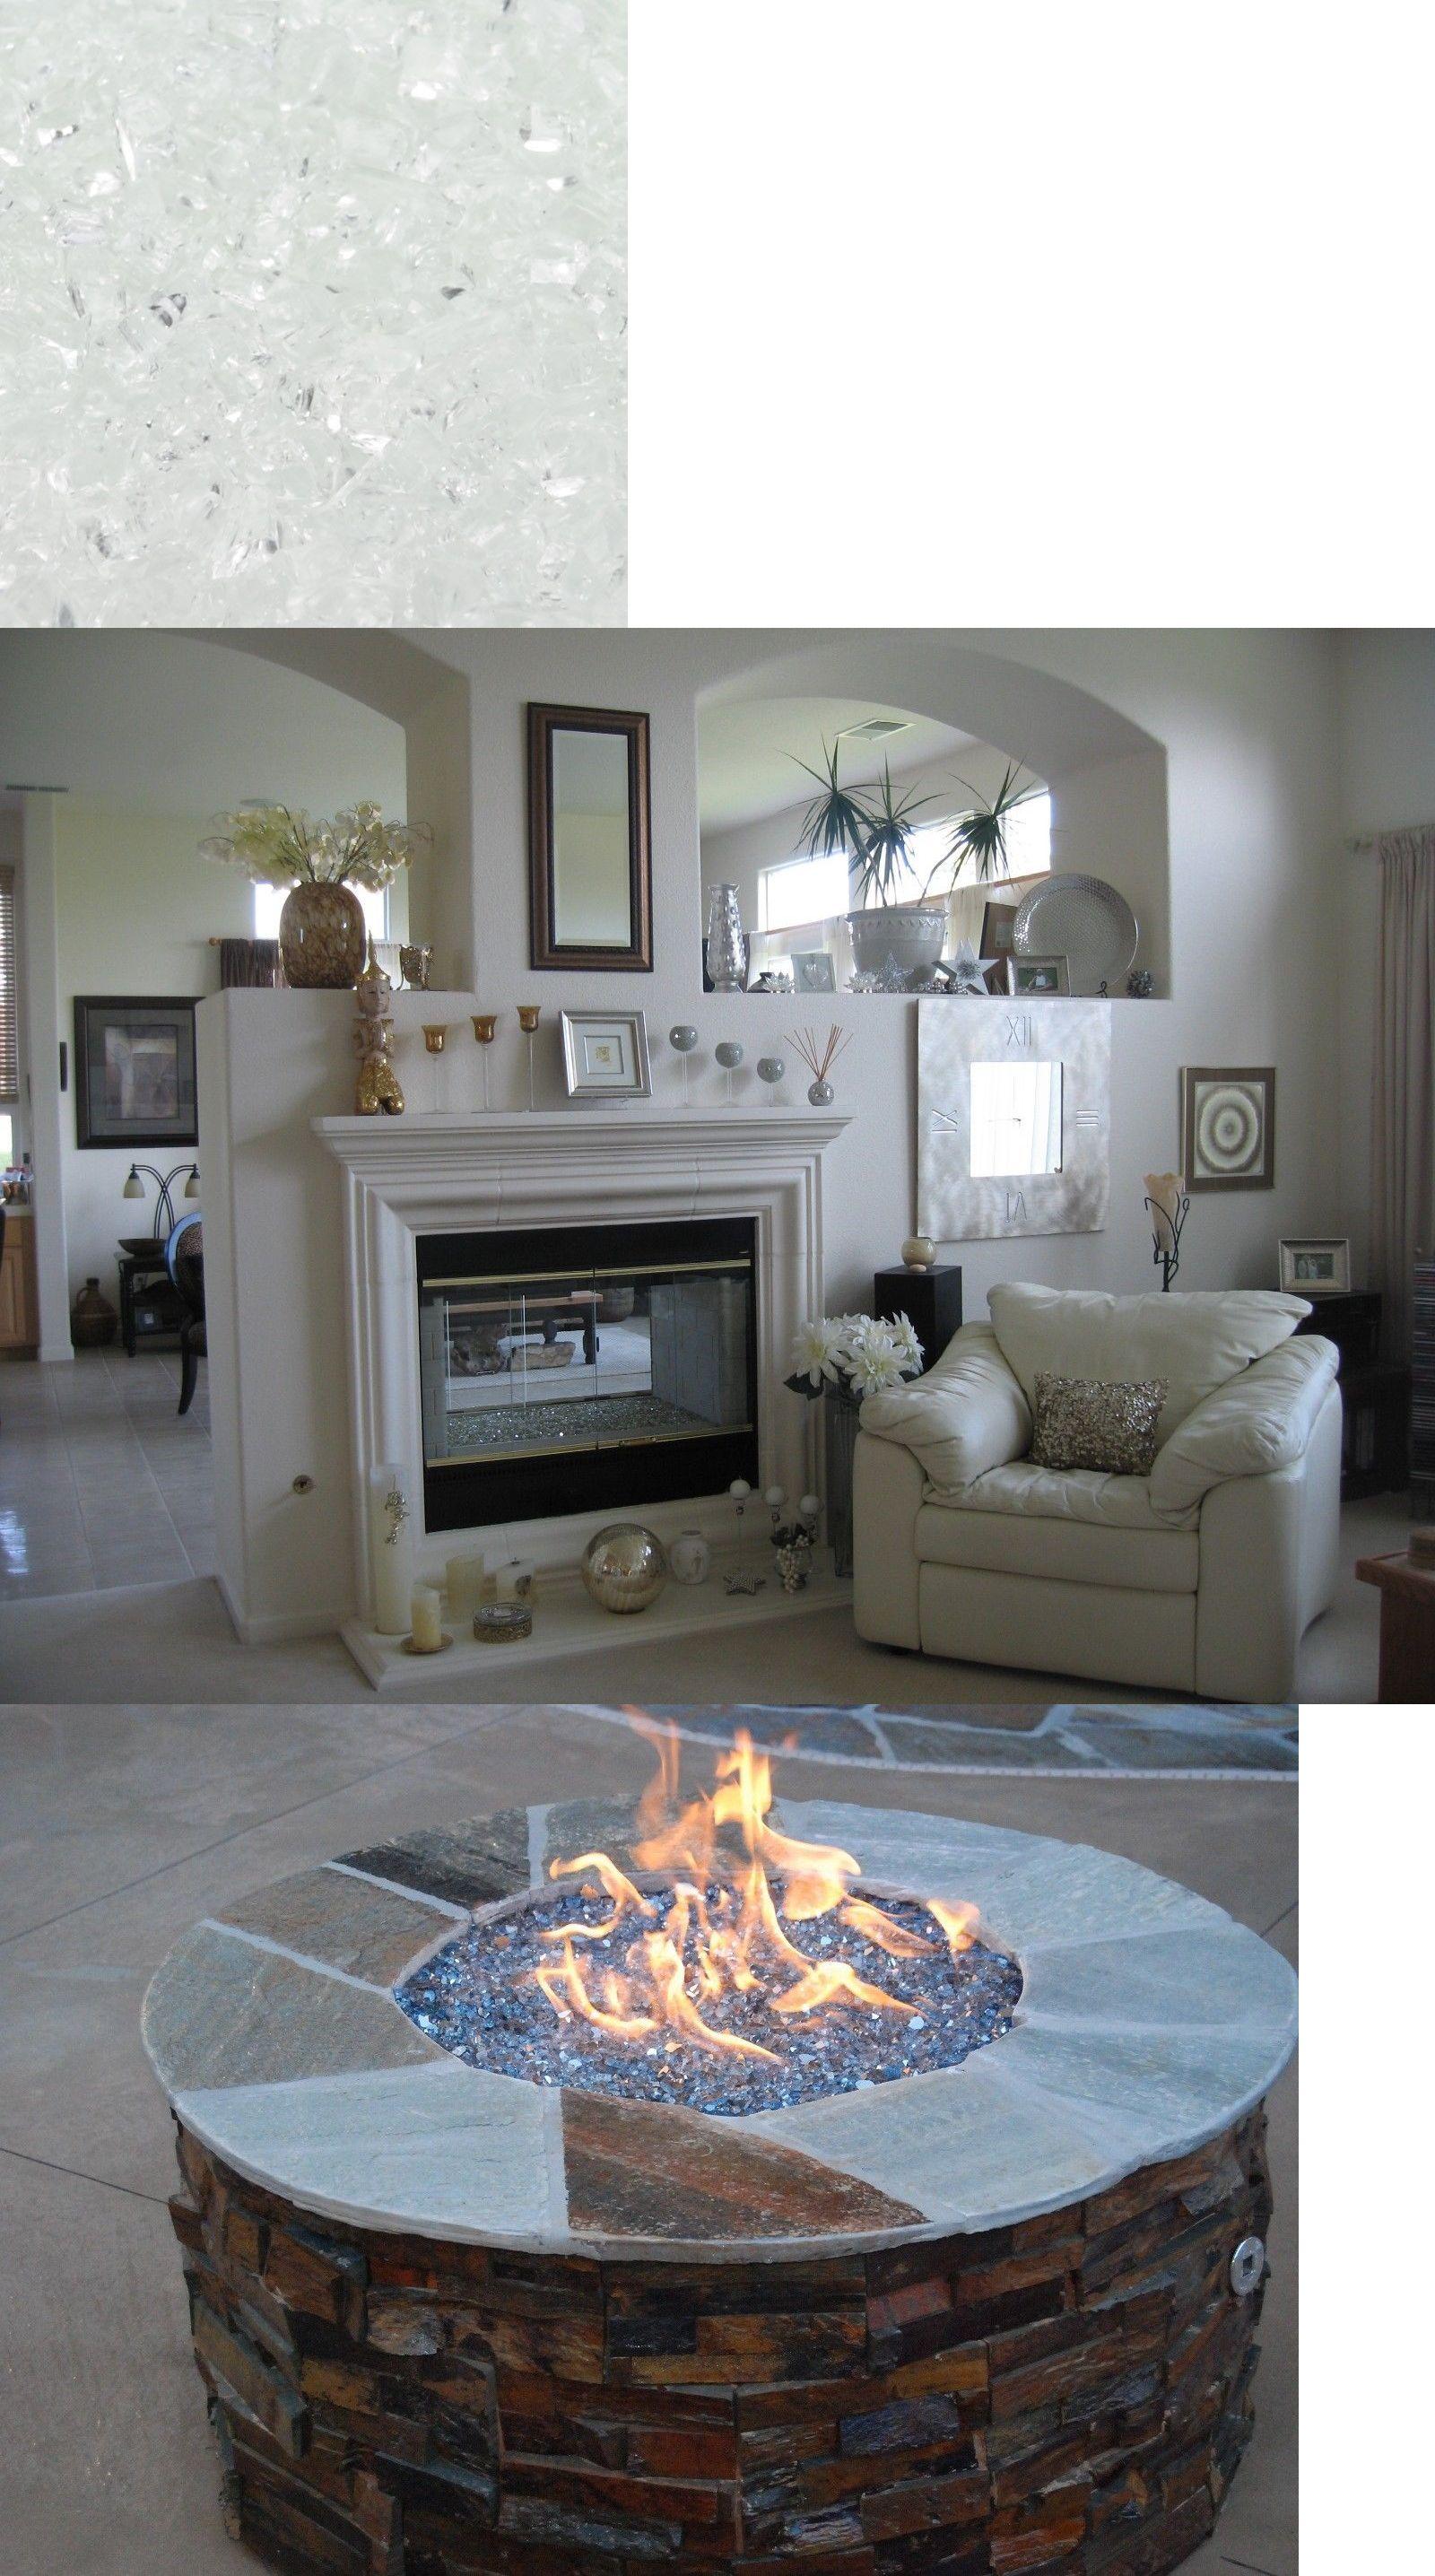 Surprising Decorative Logs Stone And Glass 38220 Crushed Ice Starfire Home Interior And Landscaping Sapresignezvosmurscom